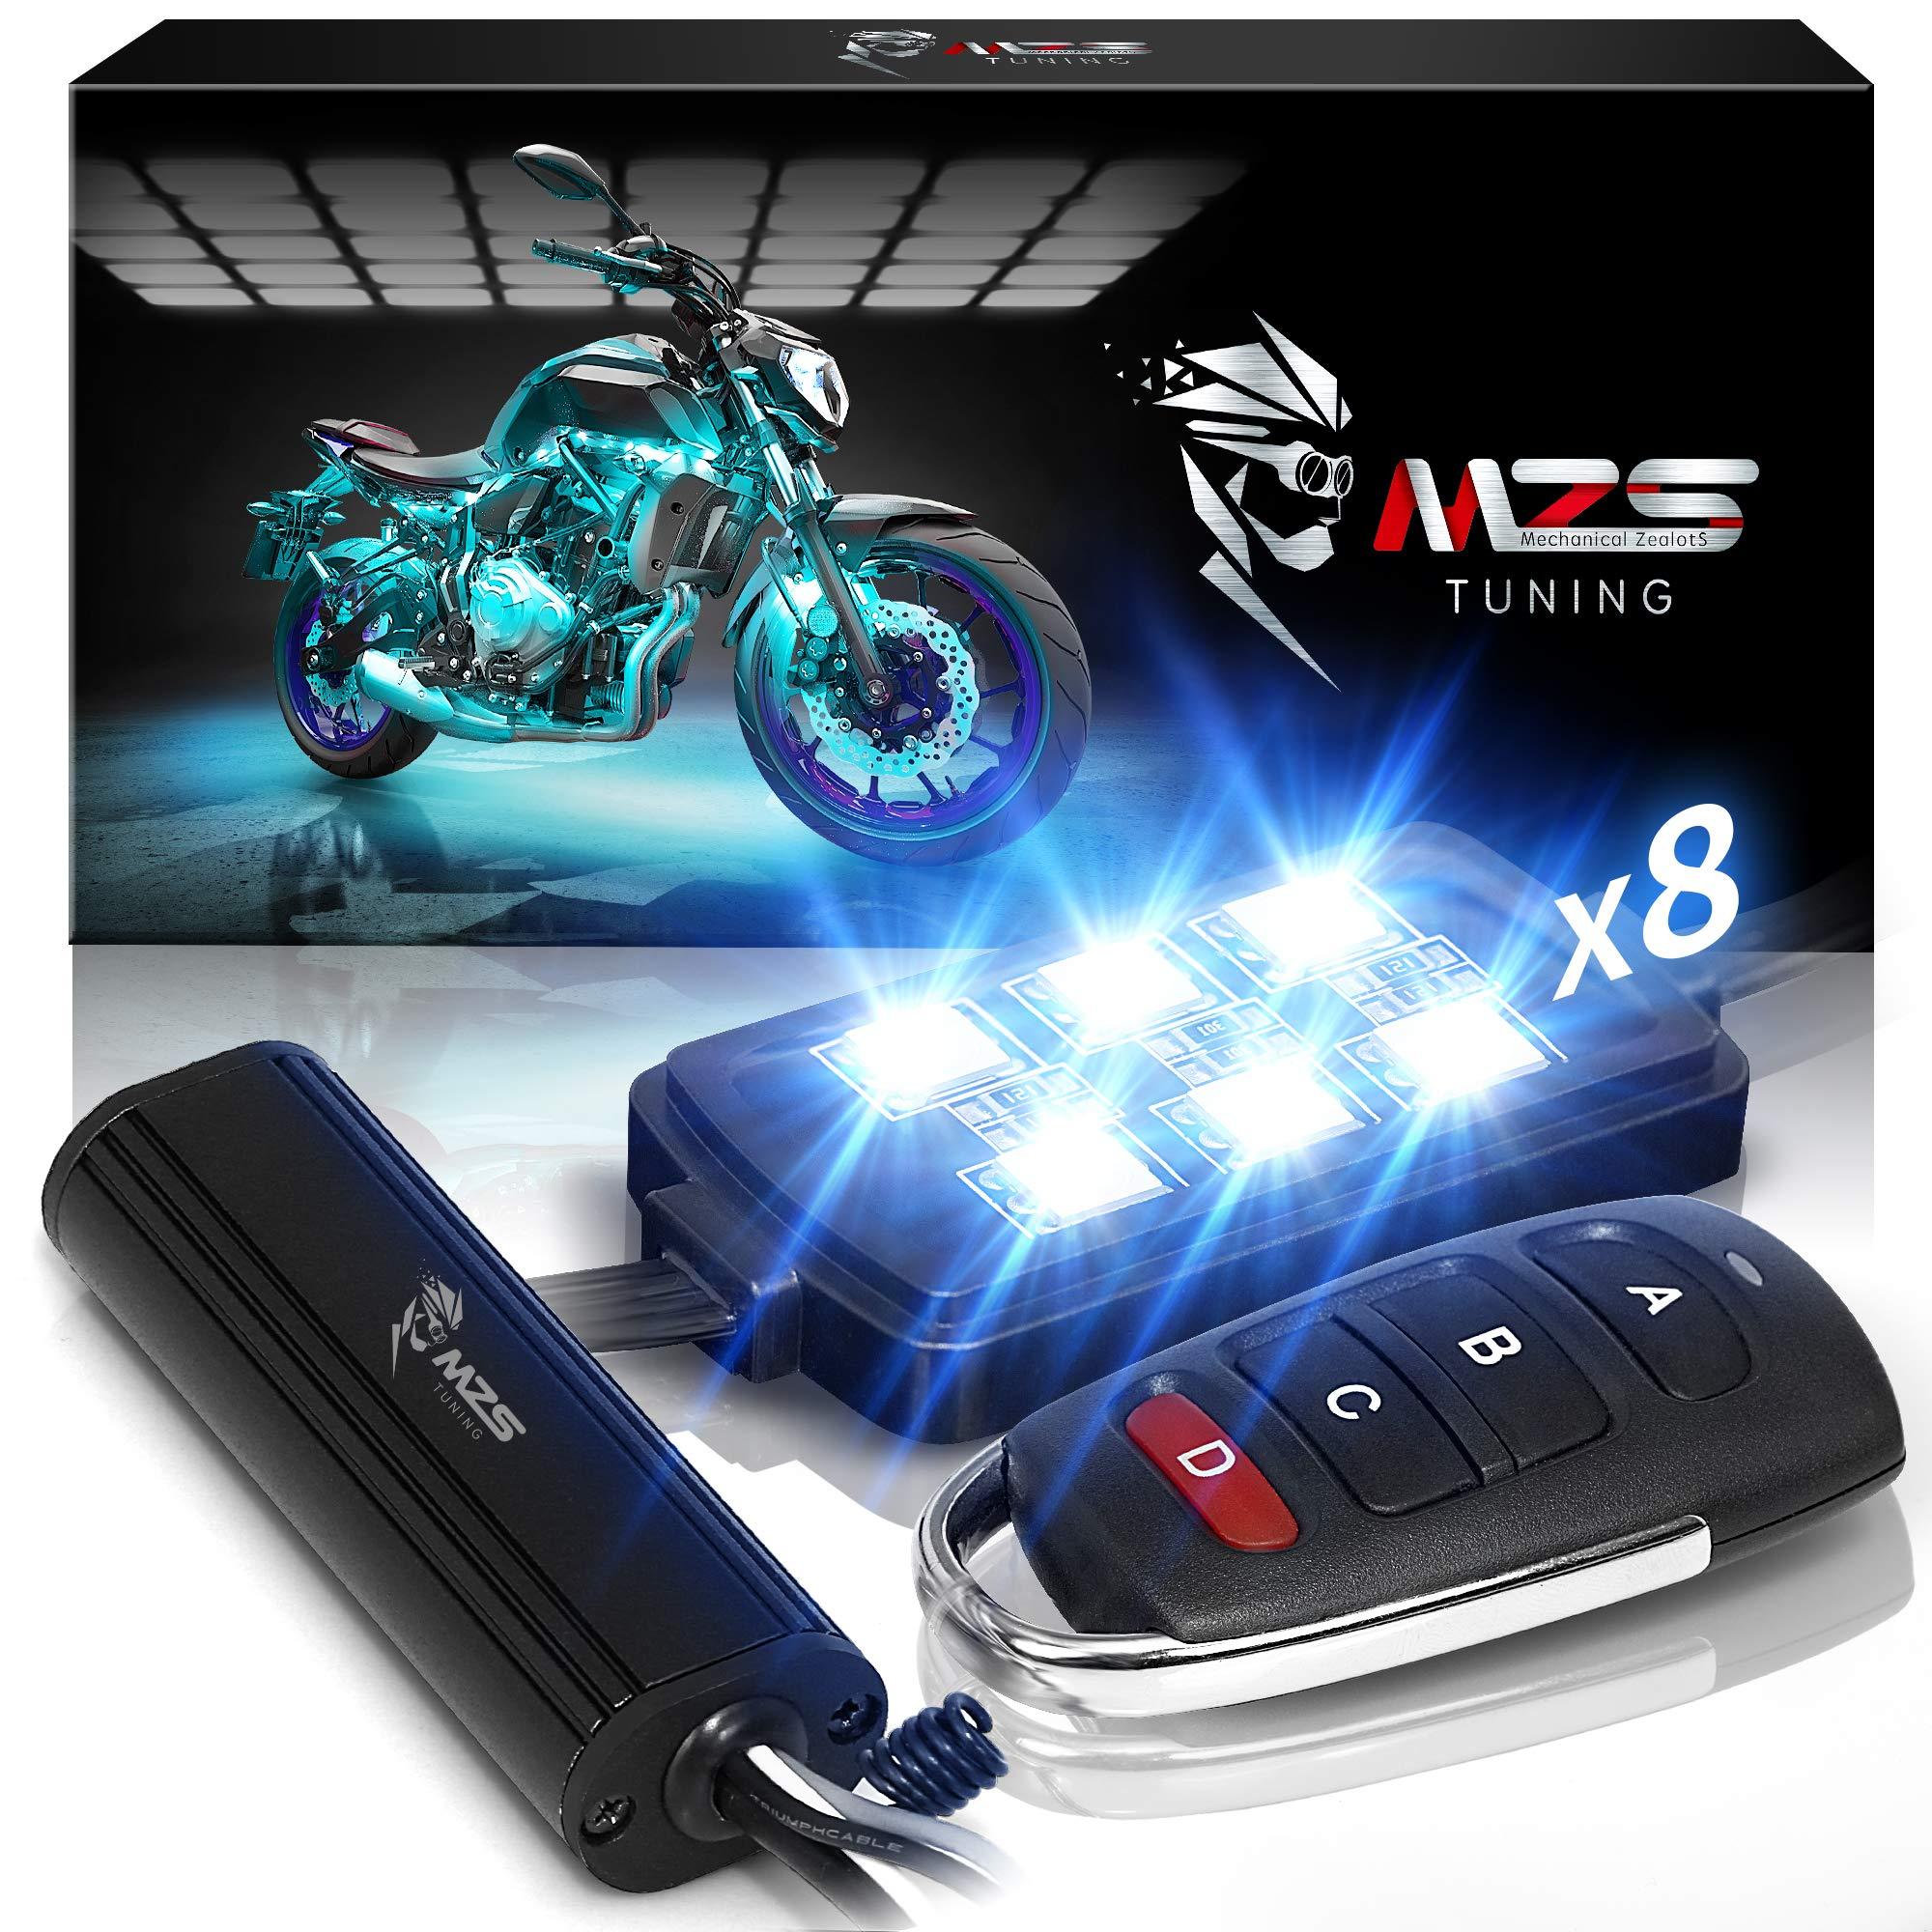 MZS LED Light Kit Multi-Color Neon RGB Strips Wireless Remote Controller for ATV UTV Cruiser Harley Davidson Ducati Suzuki Honda Triumph BMW Kawasaki Yamaha (Pack of 8)